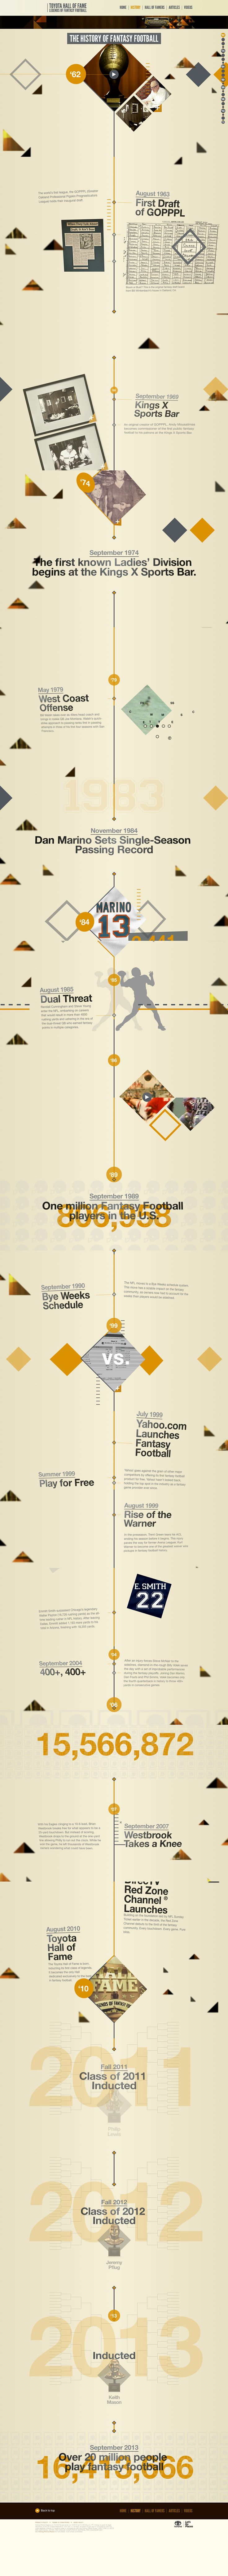 Unique Web Design on the Internet, Toyota Hall Of Fame #webdesign #webdevelopment #website